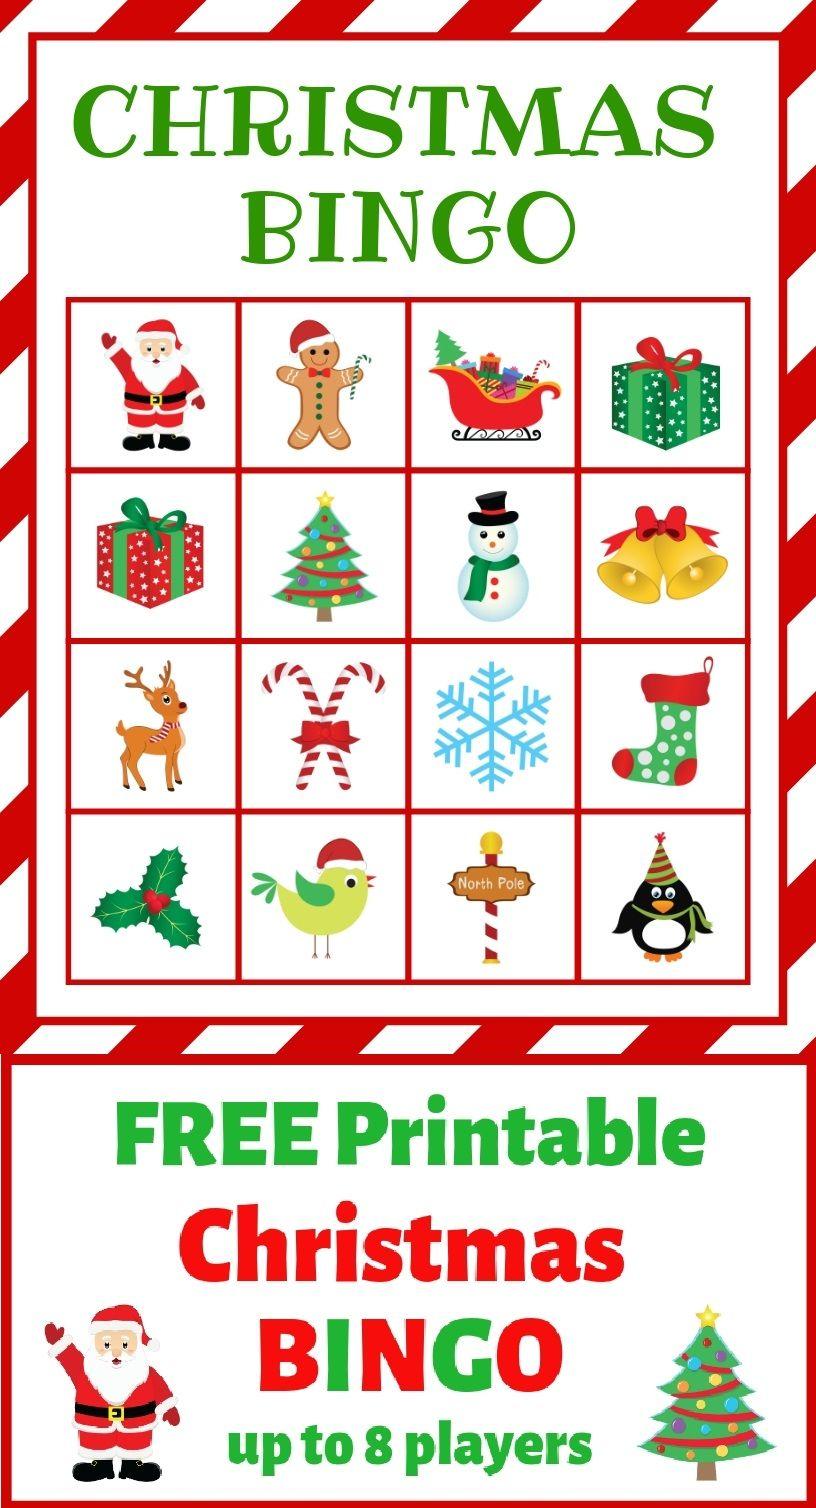 Christmas Bingo Free Printable Just What We Eat Christmas Bingo Free Christmas Printables Free Printables